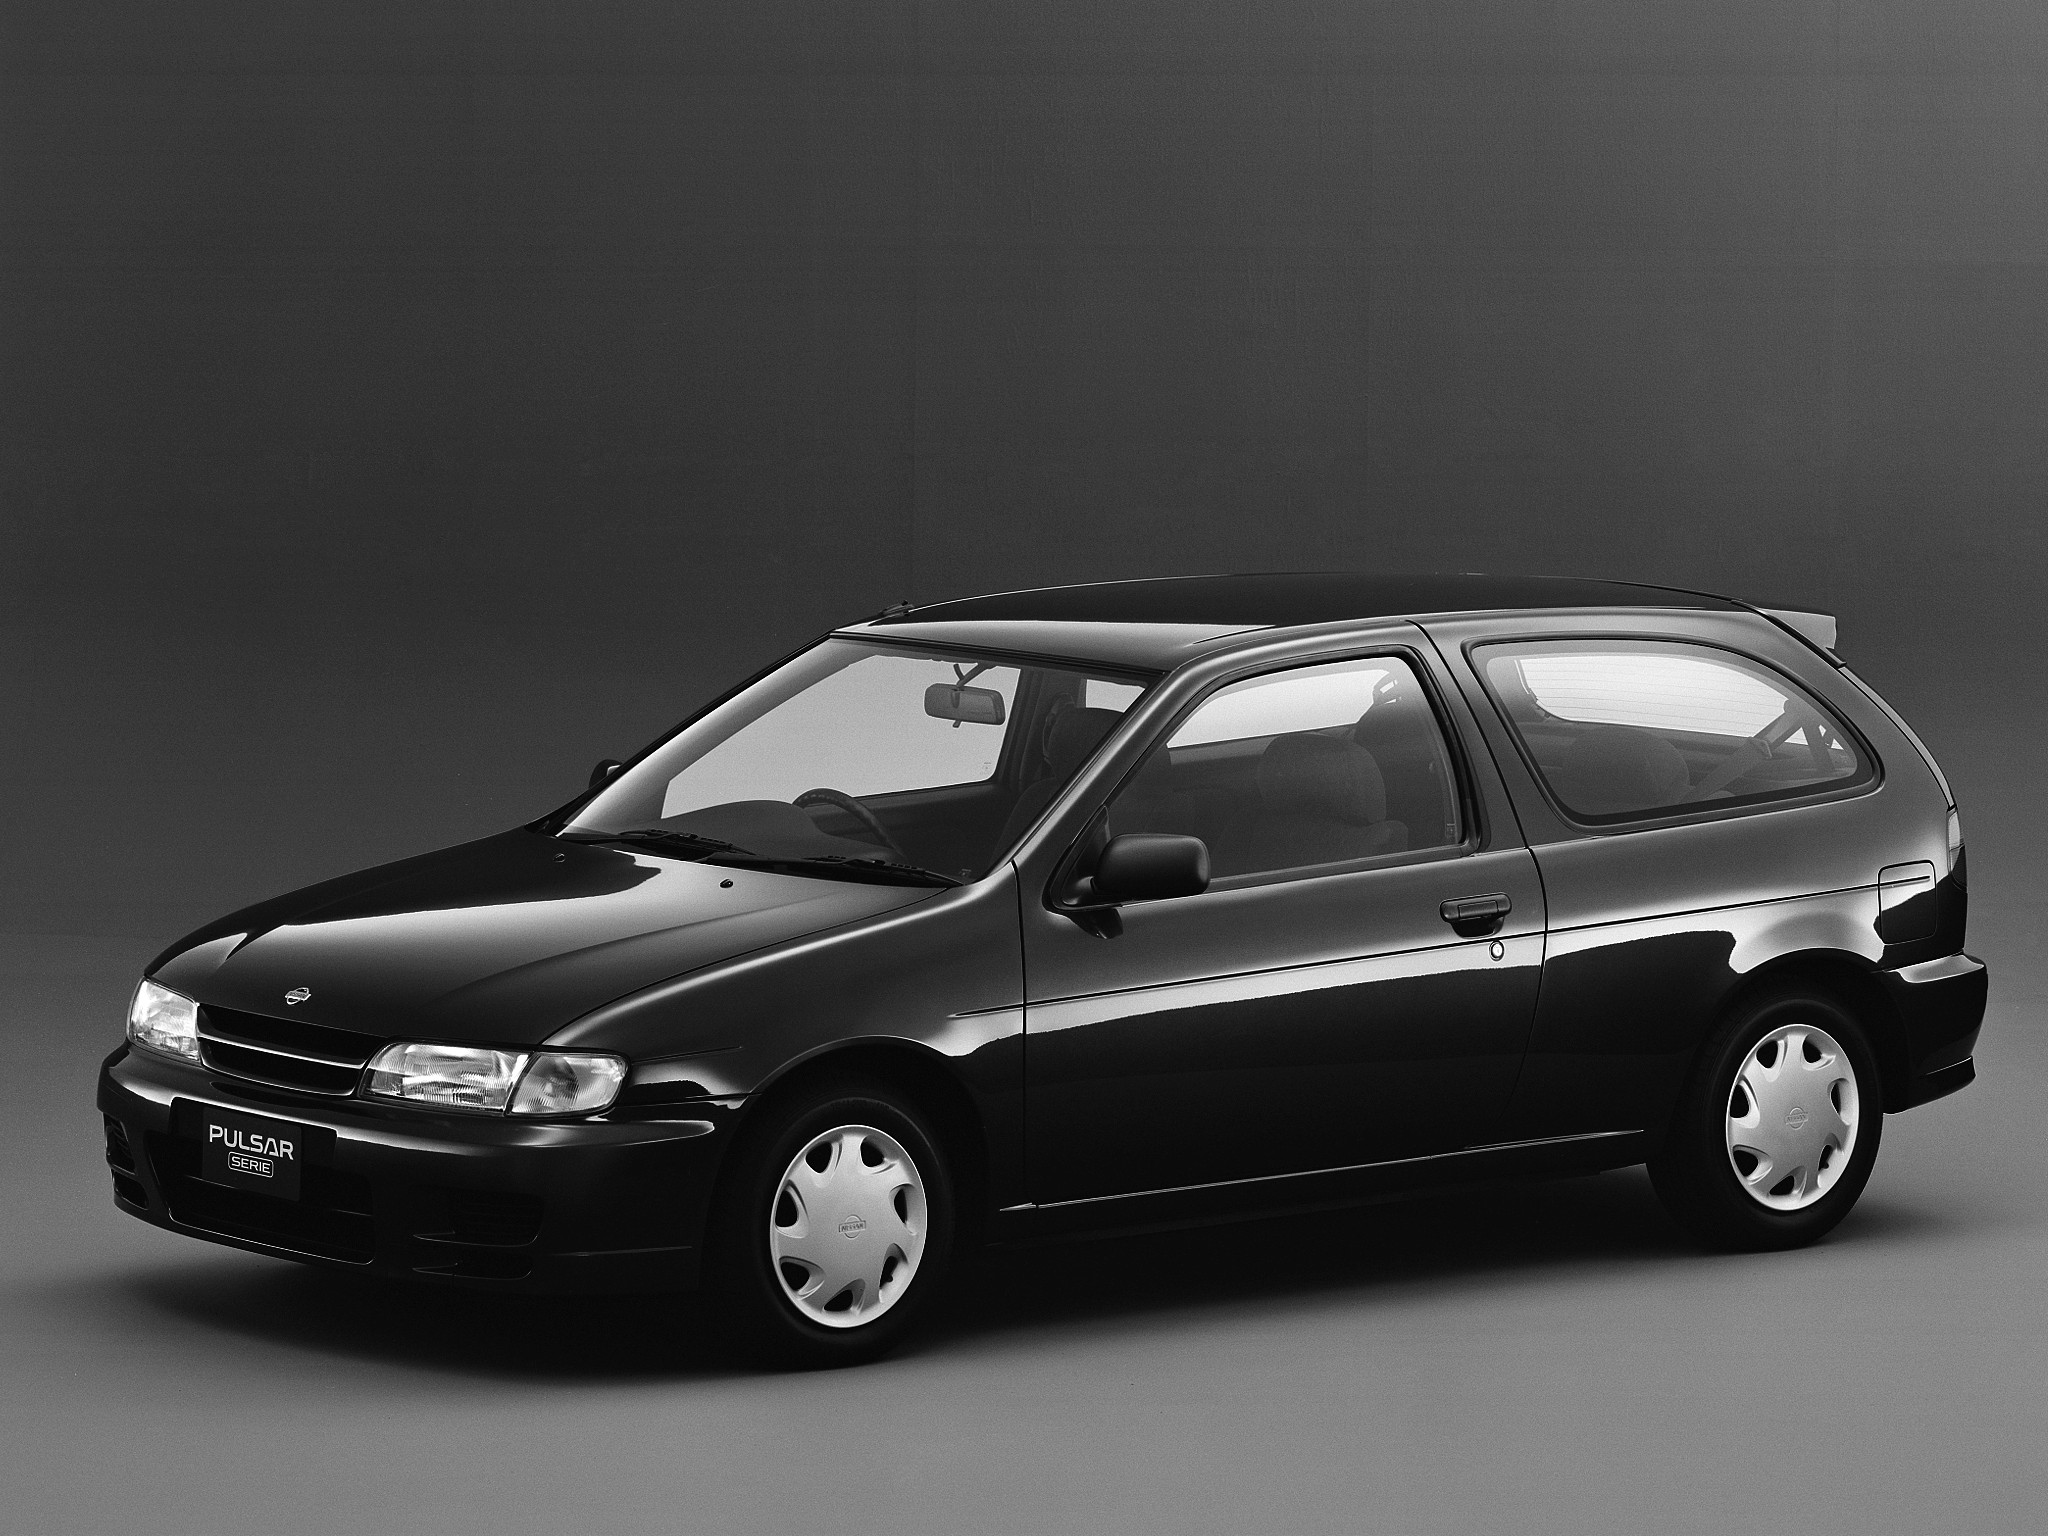 nissan almera pulsar 3 doors 1995 1996 1997 1998 1999 2000 autoevolution. Black Bedroom Furniture Sets. Home Design Ideas